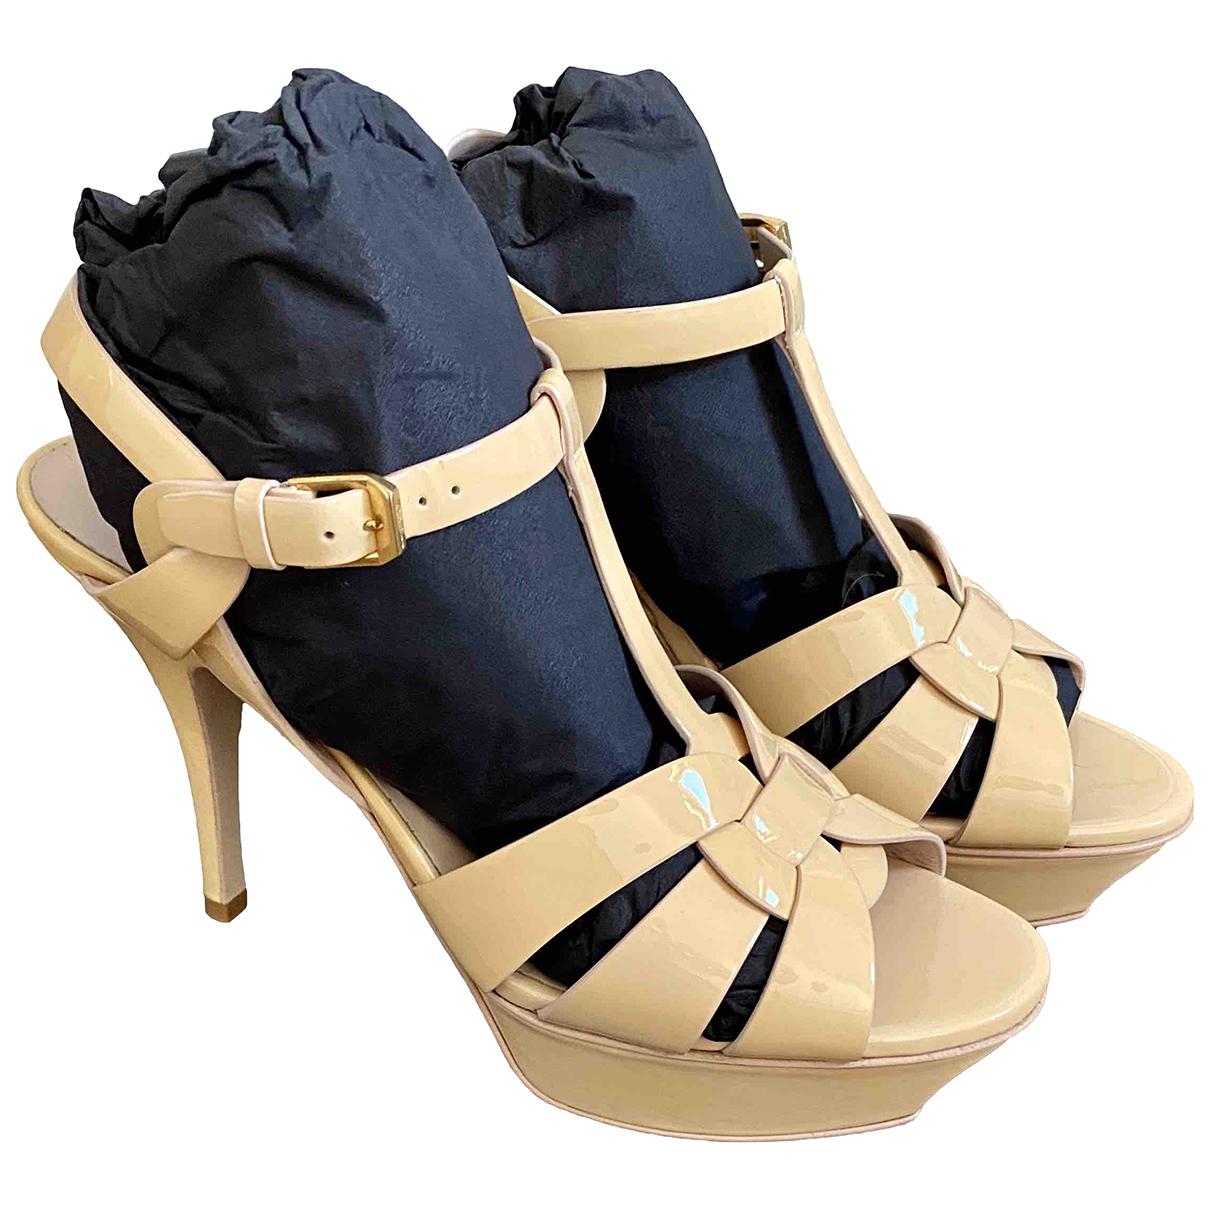 Saint Laurent Tribute Yellow Patent leather Sandals for Women 38 EU